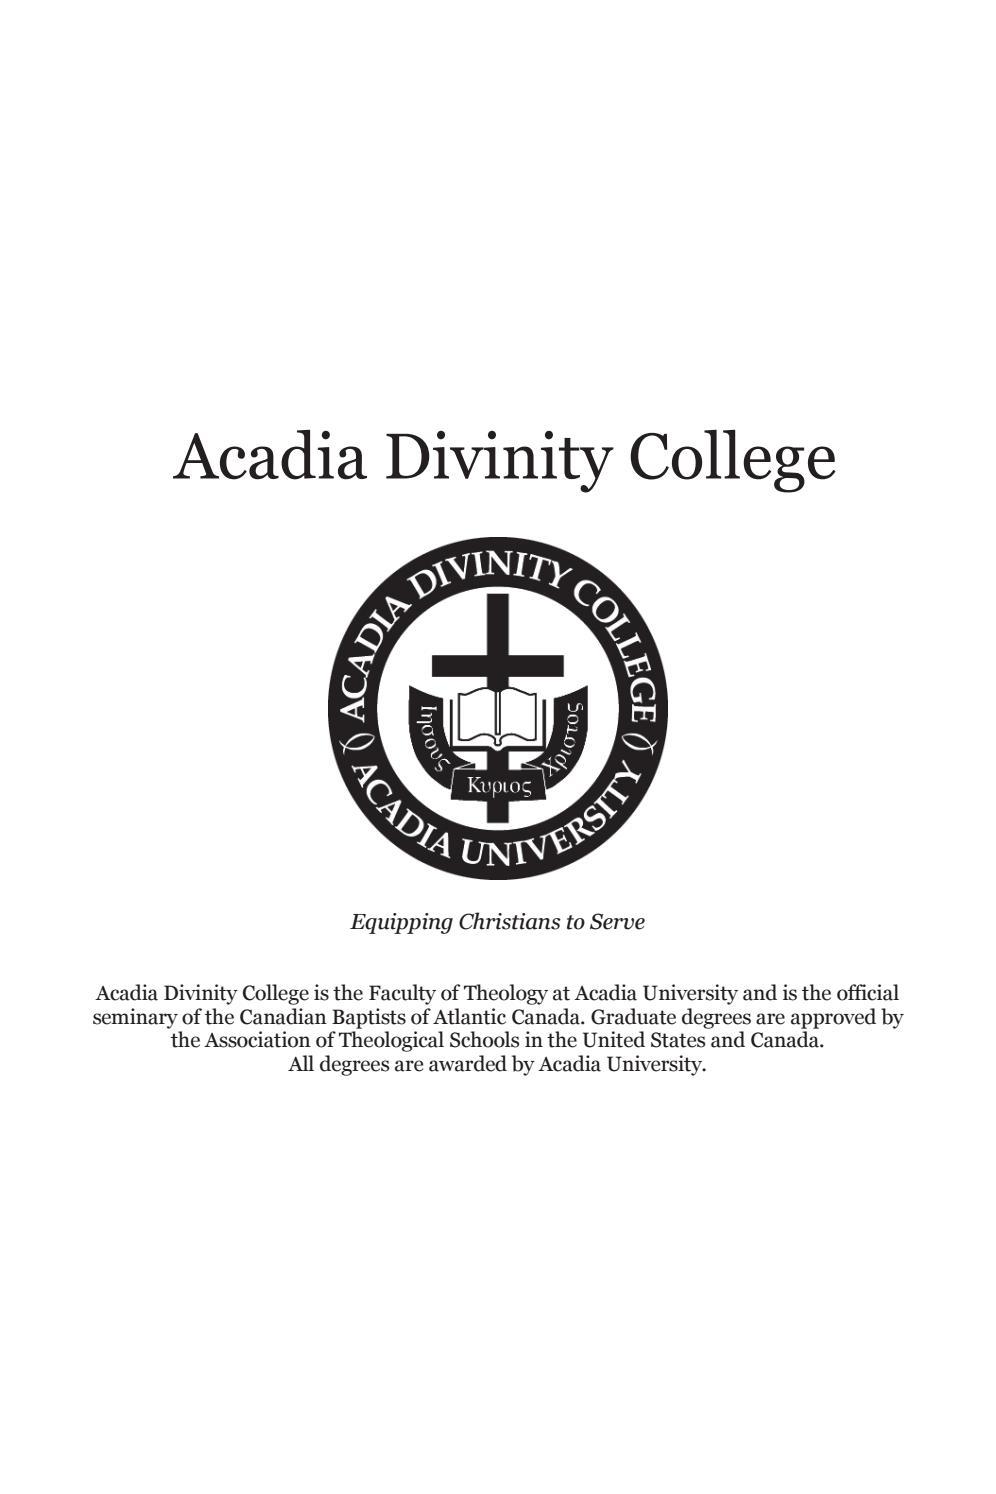 2018 2019 Adc Academic Calendaracadia Divinity College Inside St Ambrose U Iverisry Academic.calendar